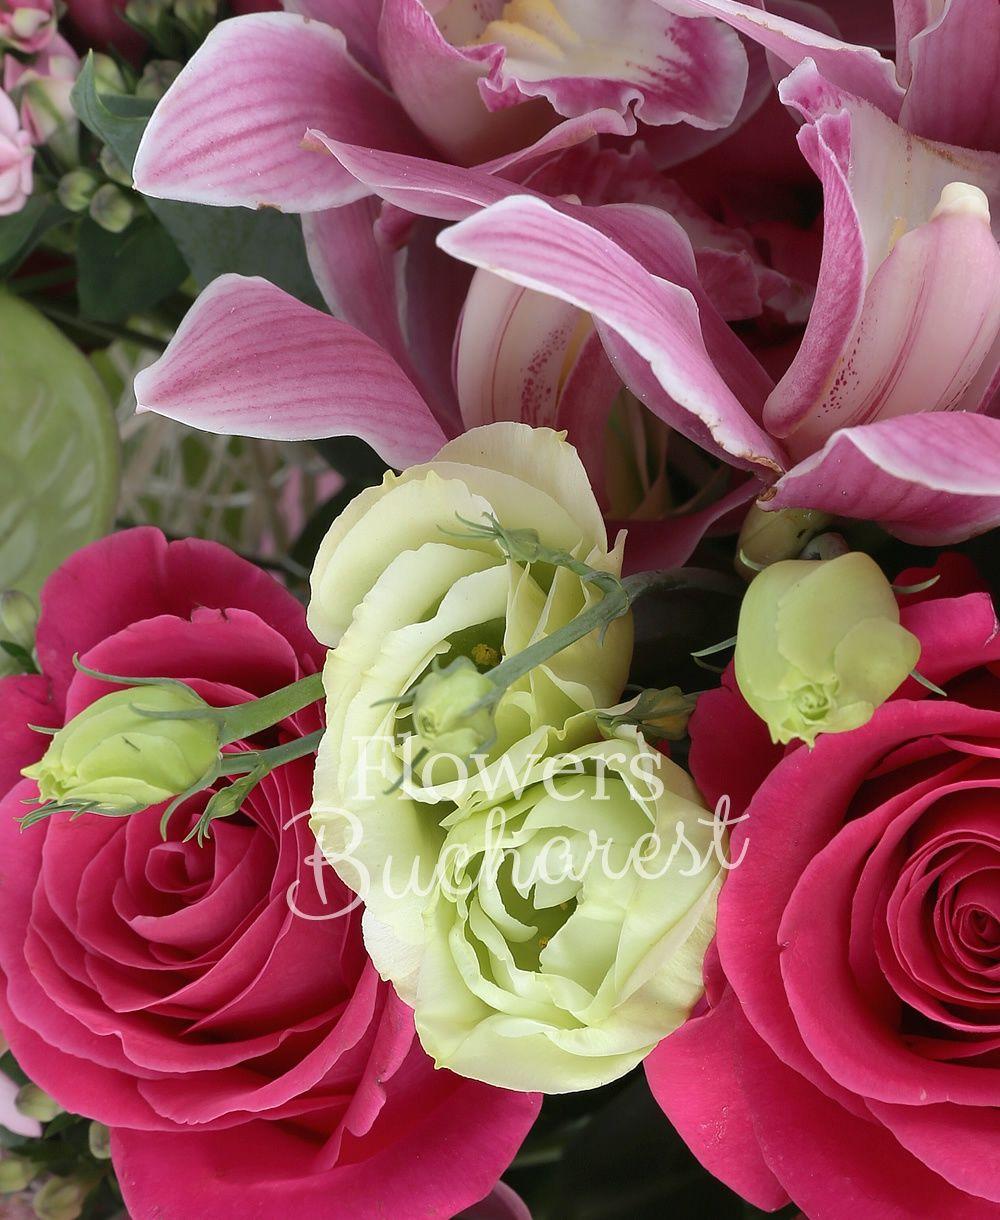 7 cyclam roses, 5 pink lisianthus, 4 pink santini, 7 cream carnations, 3 green lisianthus, 3 sedum, 5 pink bouvardia, 2 green anthurium, pink cymbidium, greenery